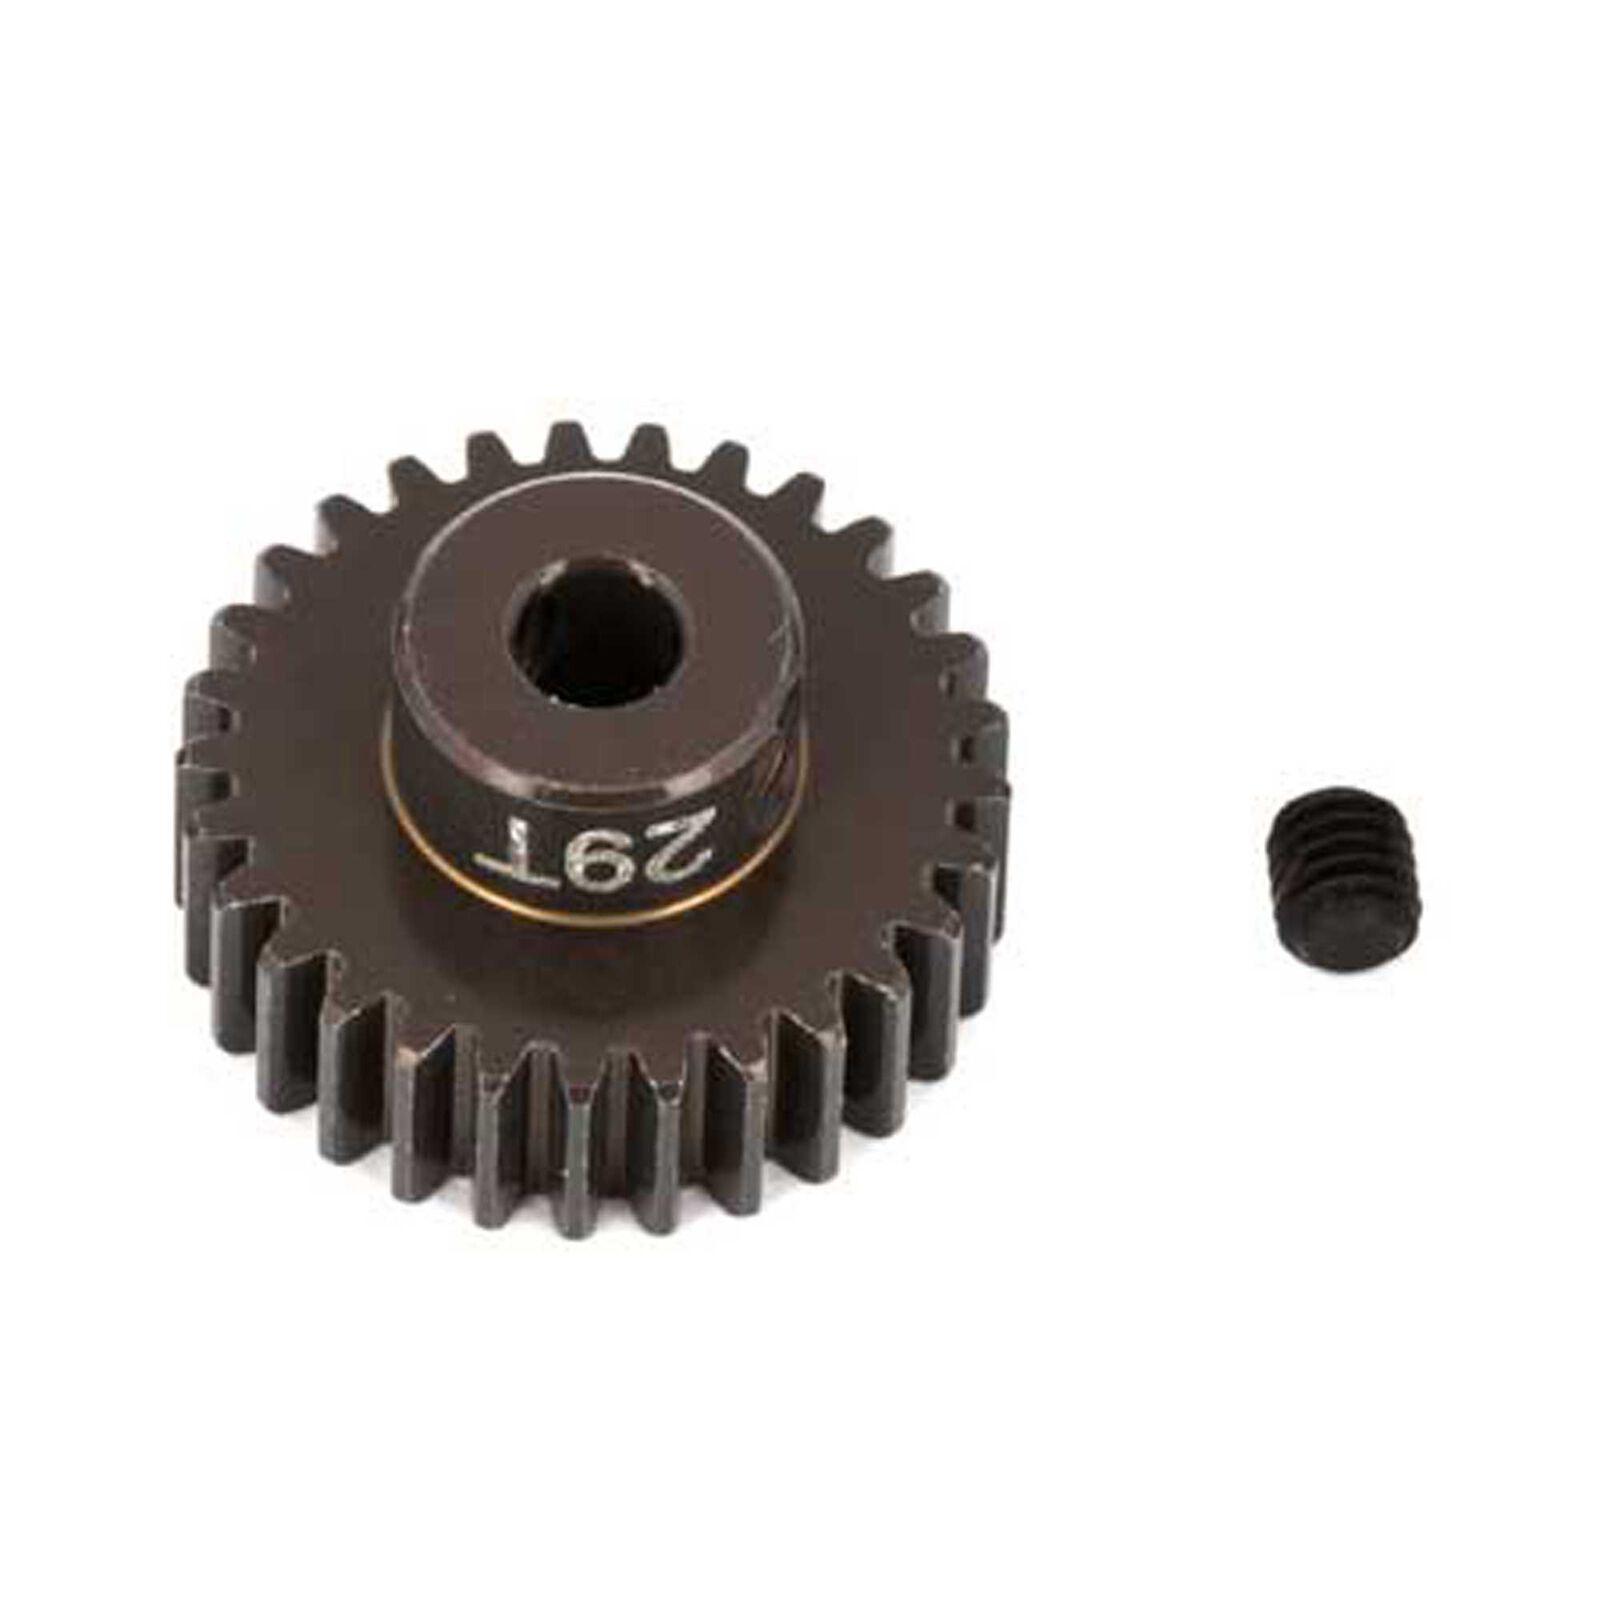 Factory Team Aluminum Pinion Gear, 29T, 48P, 1/8 shaft